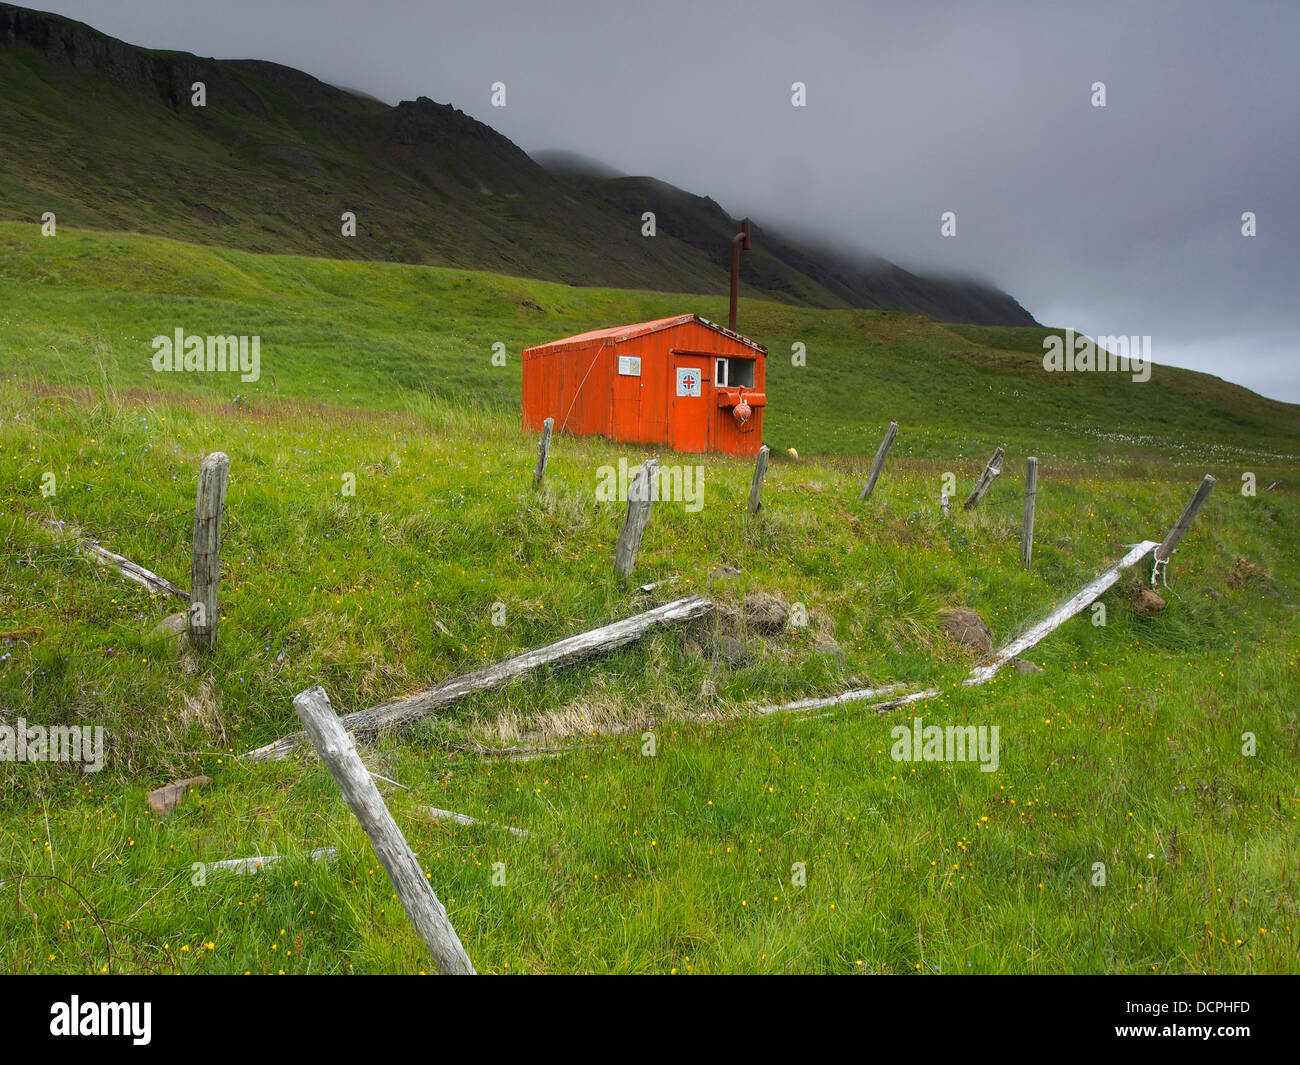 Emergency hut, Brunavík, Iceland - Stock Image